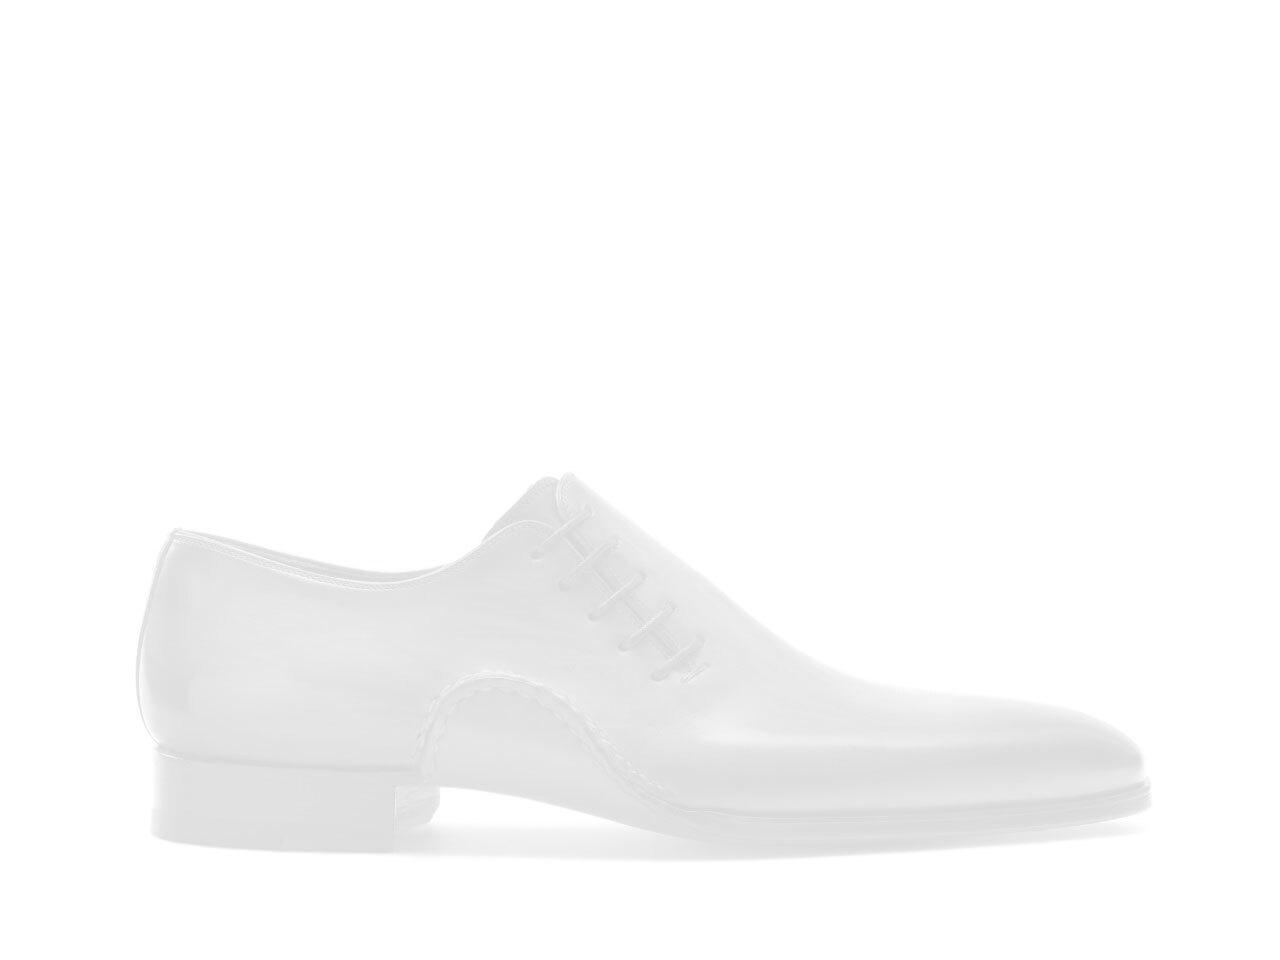 Pair of the Magnanni Echo Lo II Grey Men's Sneakers